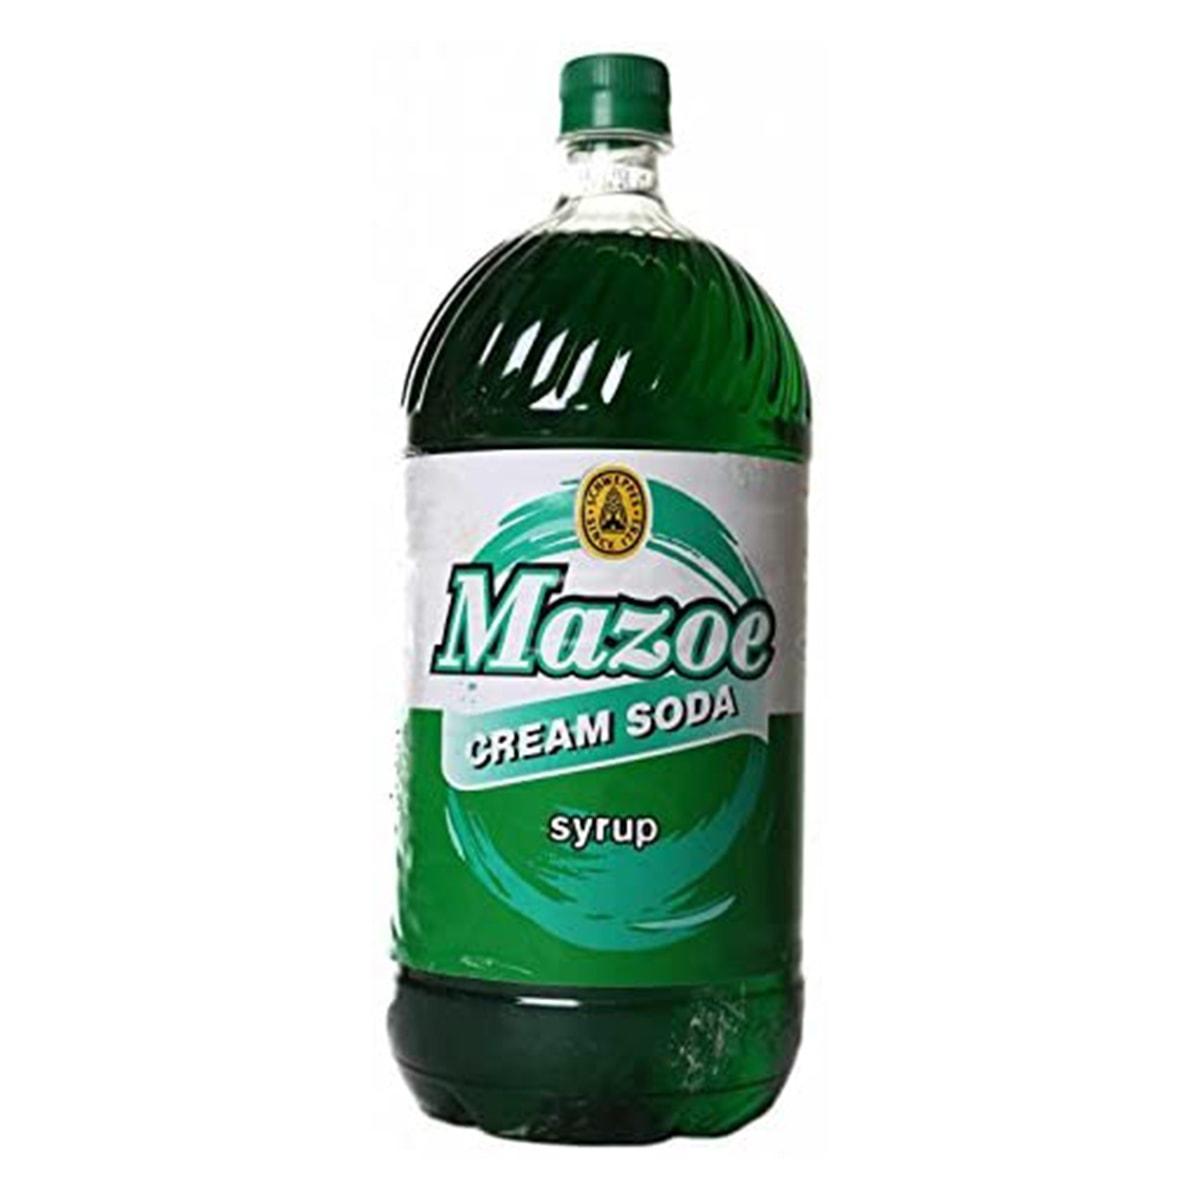 Buy Schweppes Zimbabwe Mazoe Cream Soda Syrup - 2 Litre